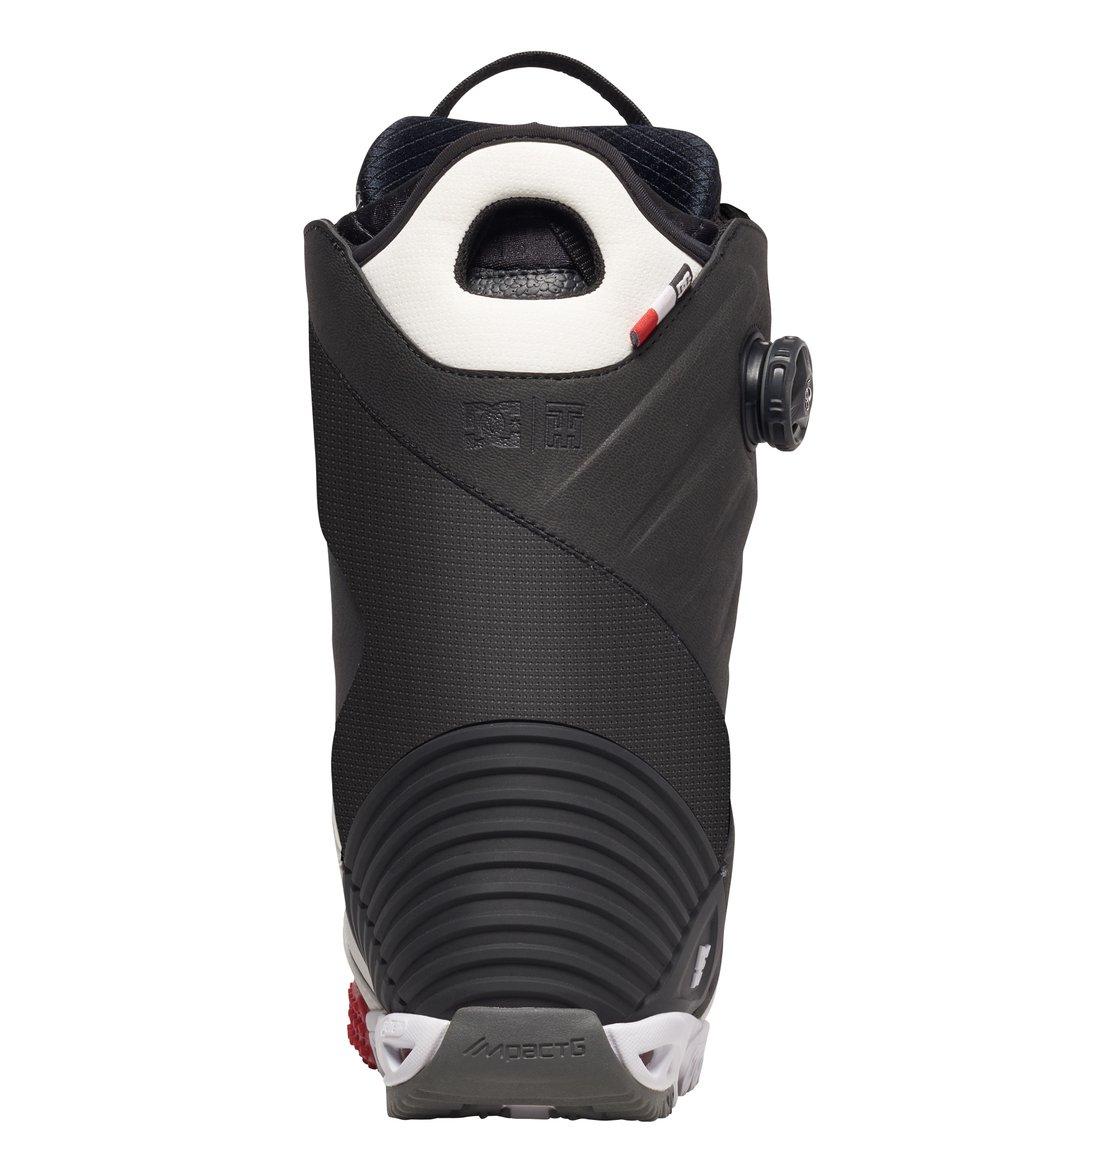 De Torstein Snowboard Dc Horgmo Shoes Boots Adyo100023 TxqwExFz8